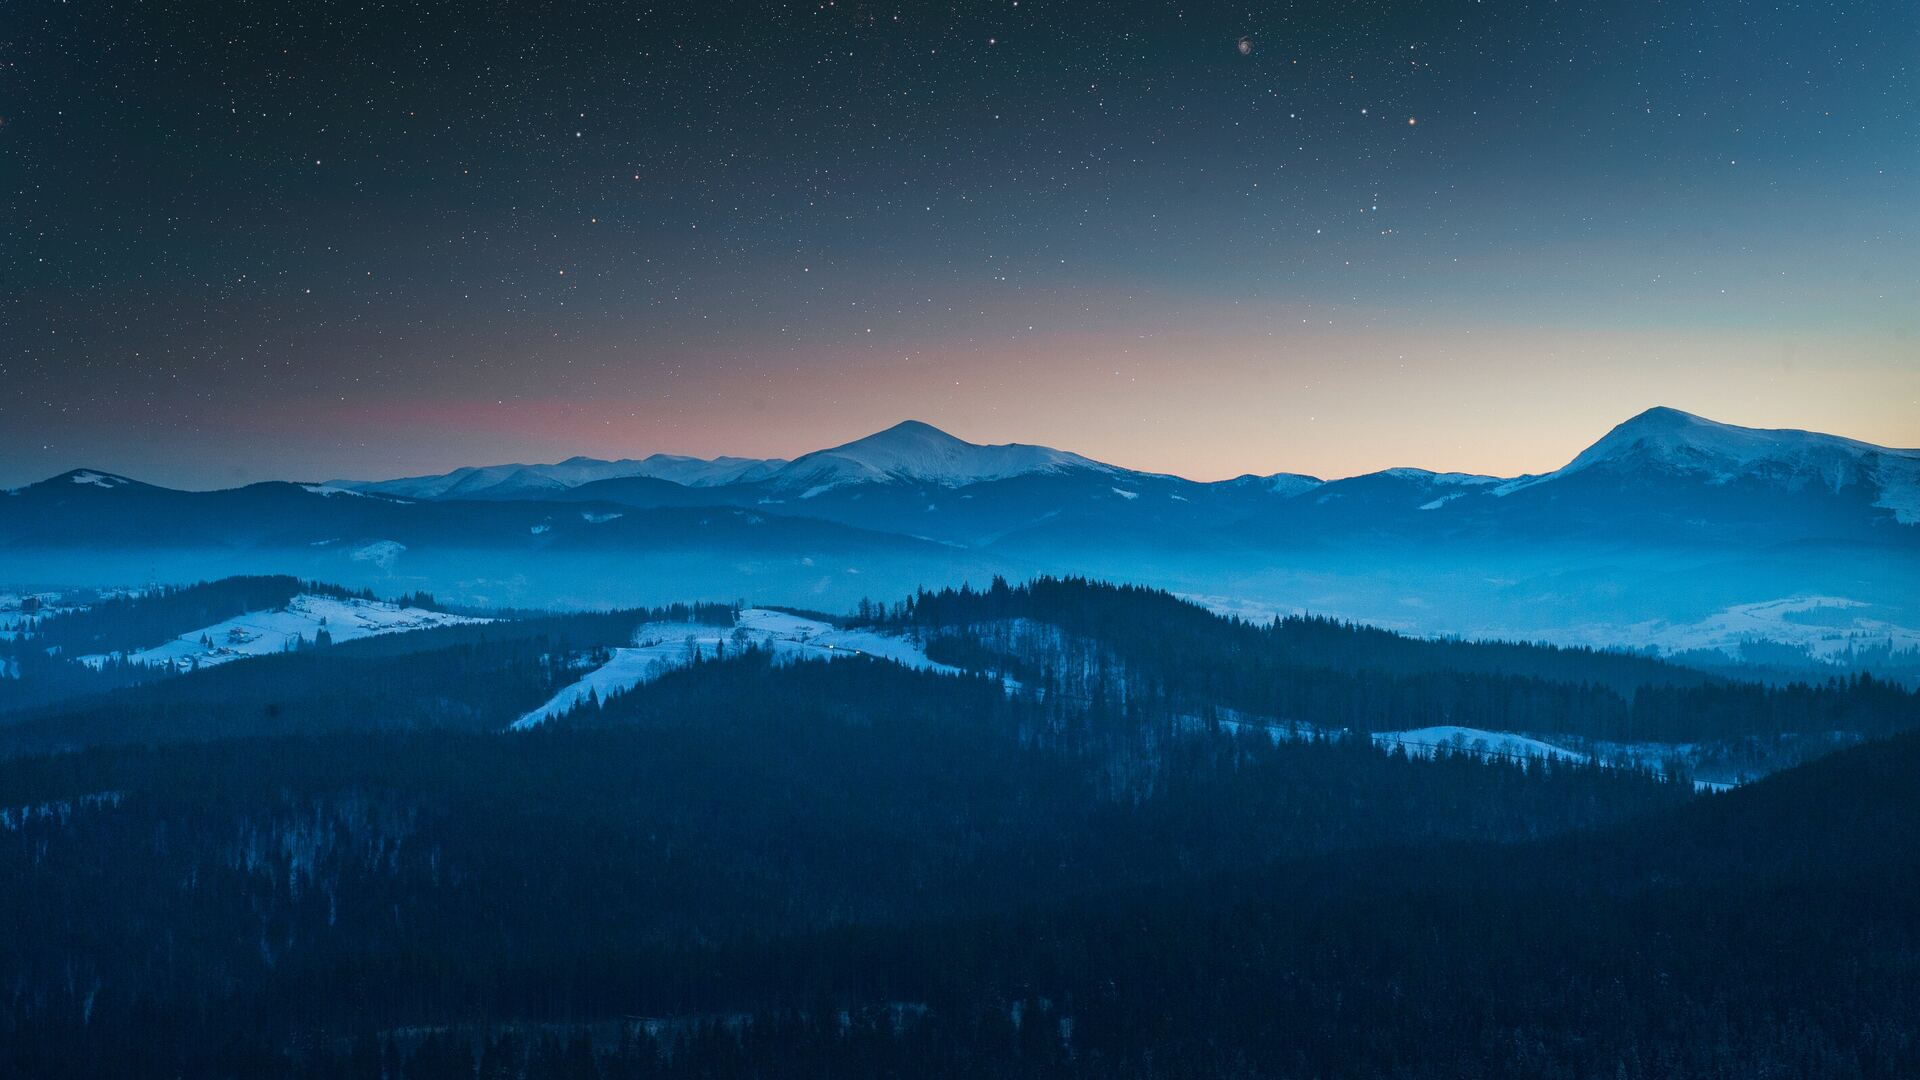 1920x1080 starry night sky